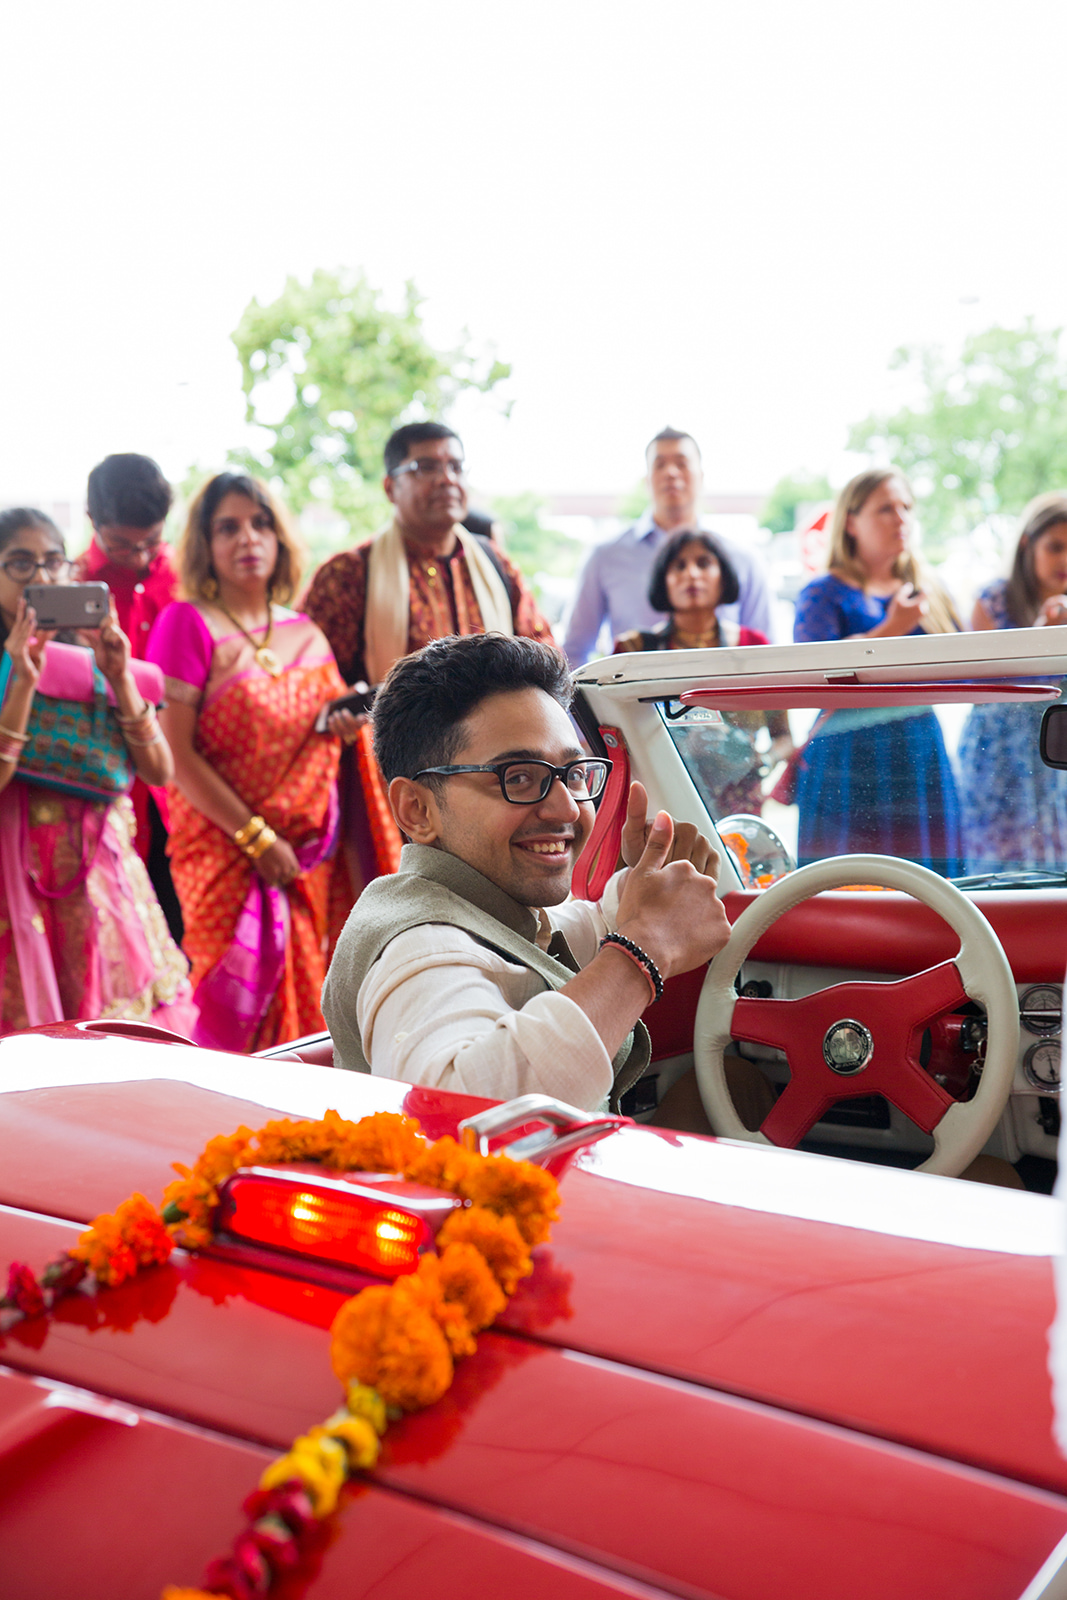 Le Cape Weddings - Sumeet and Chavi - Vidai --21.jpg